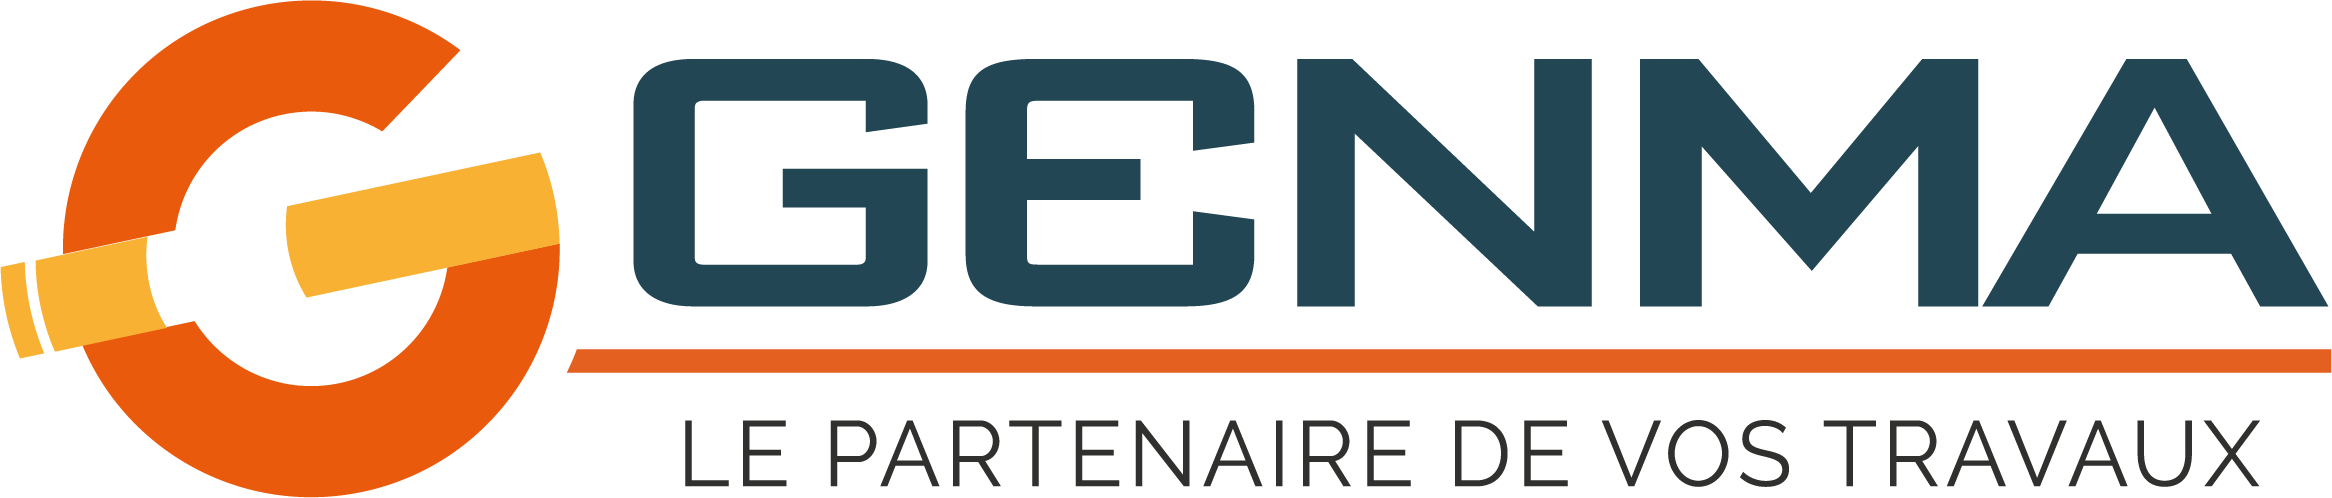 GENMA | Le partenaire de vos travaux